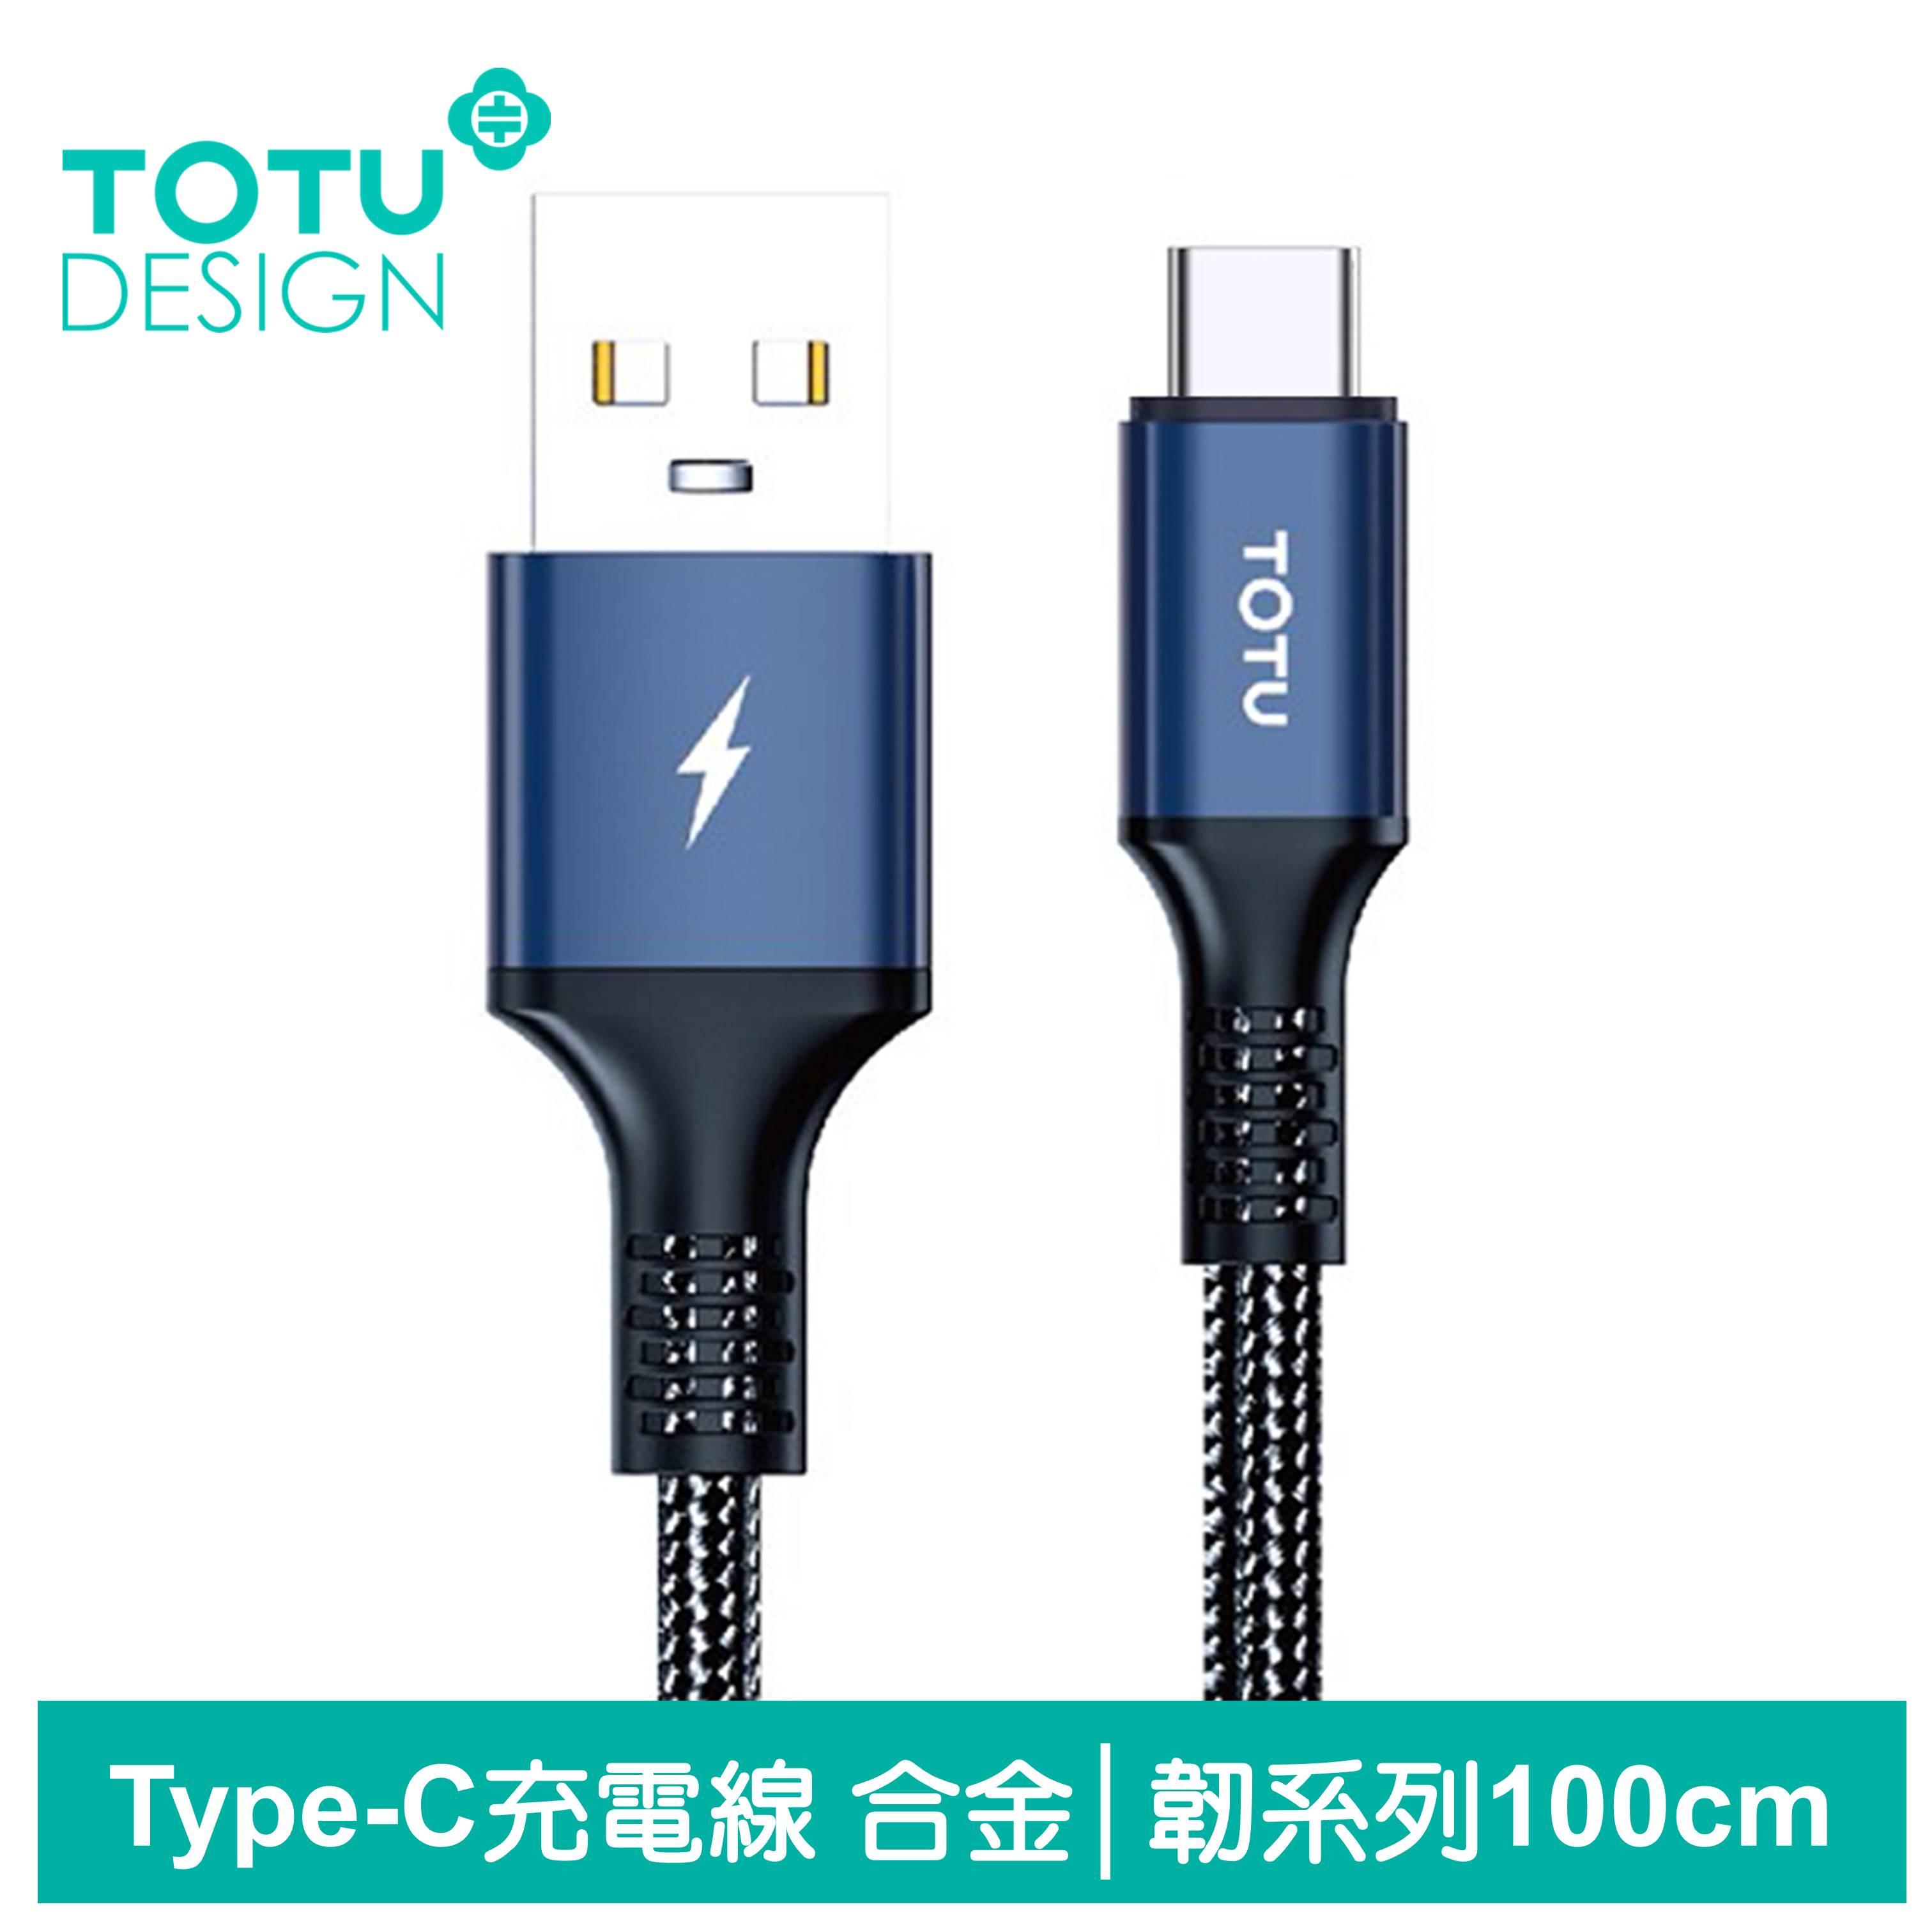 TOTU台灣官方 Type-C充電線傳輸線快充線編織線 2A快充 韌系列 100cm 藍色